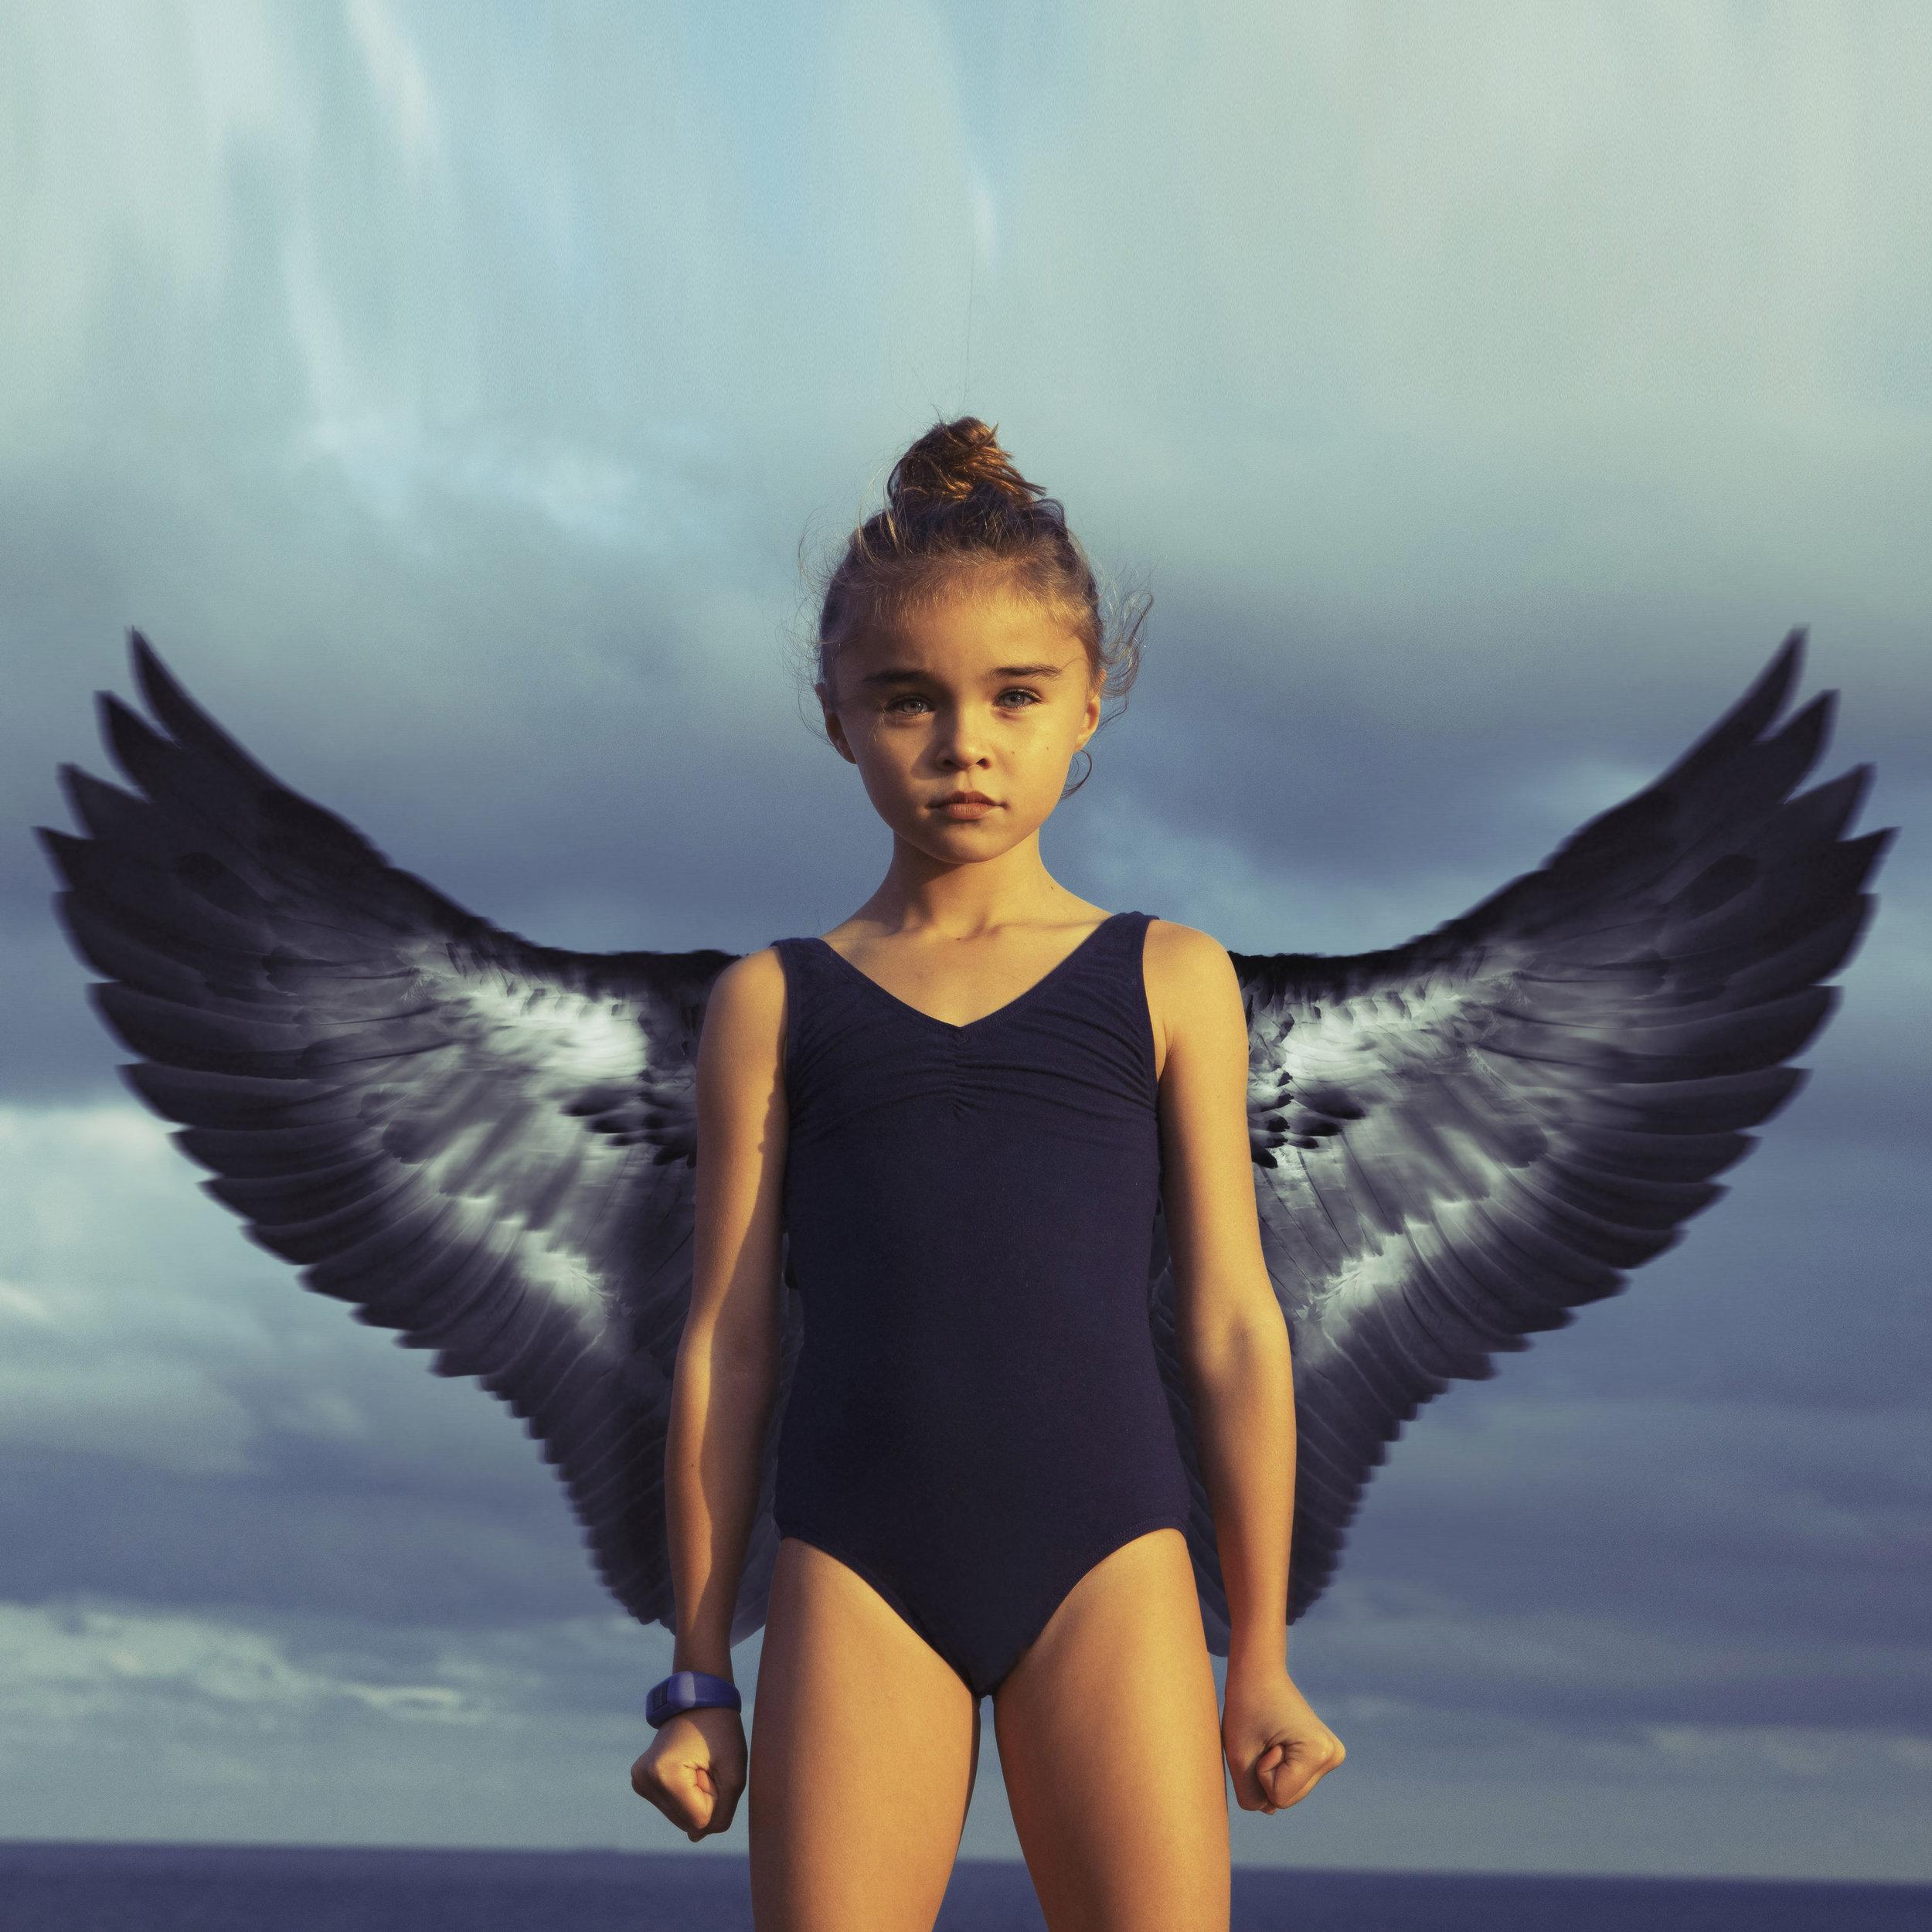 Lili Wings COL SQ.jpg